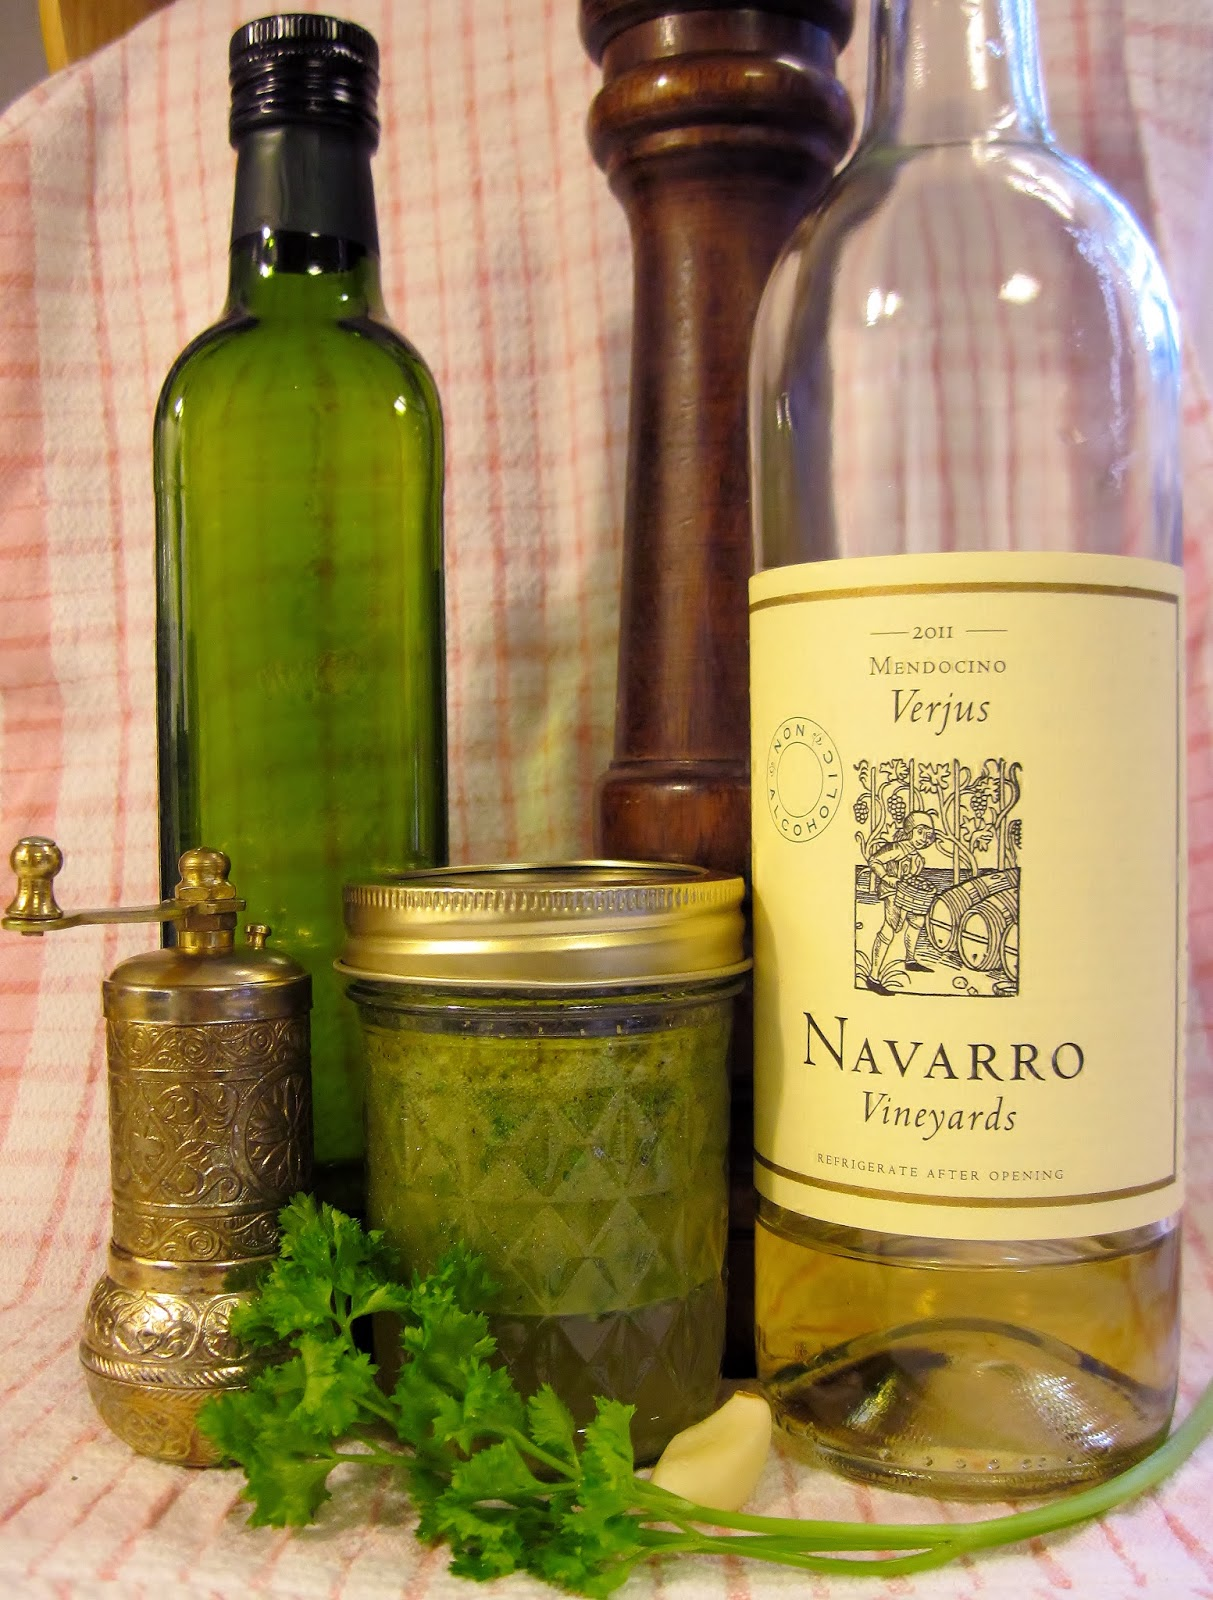 verjus vinaigrette salad dressing